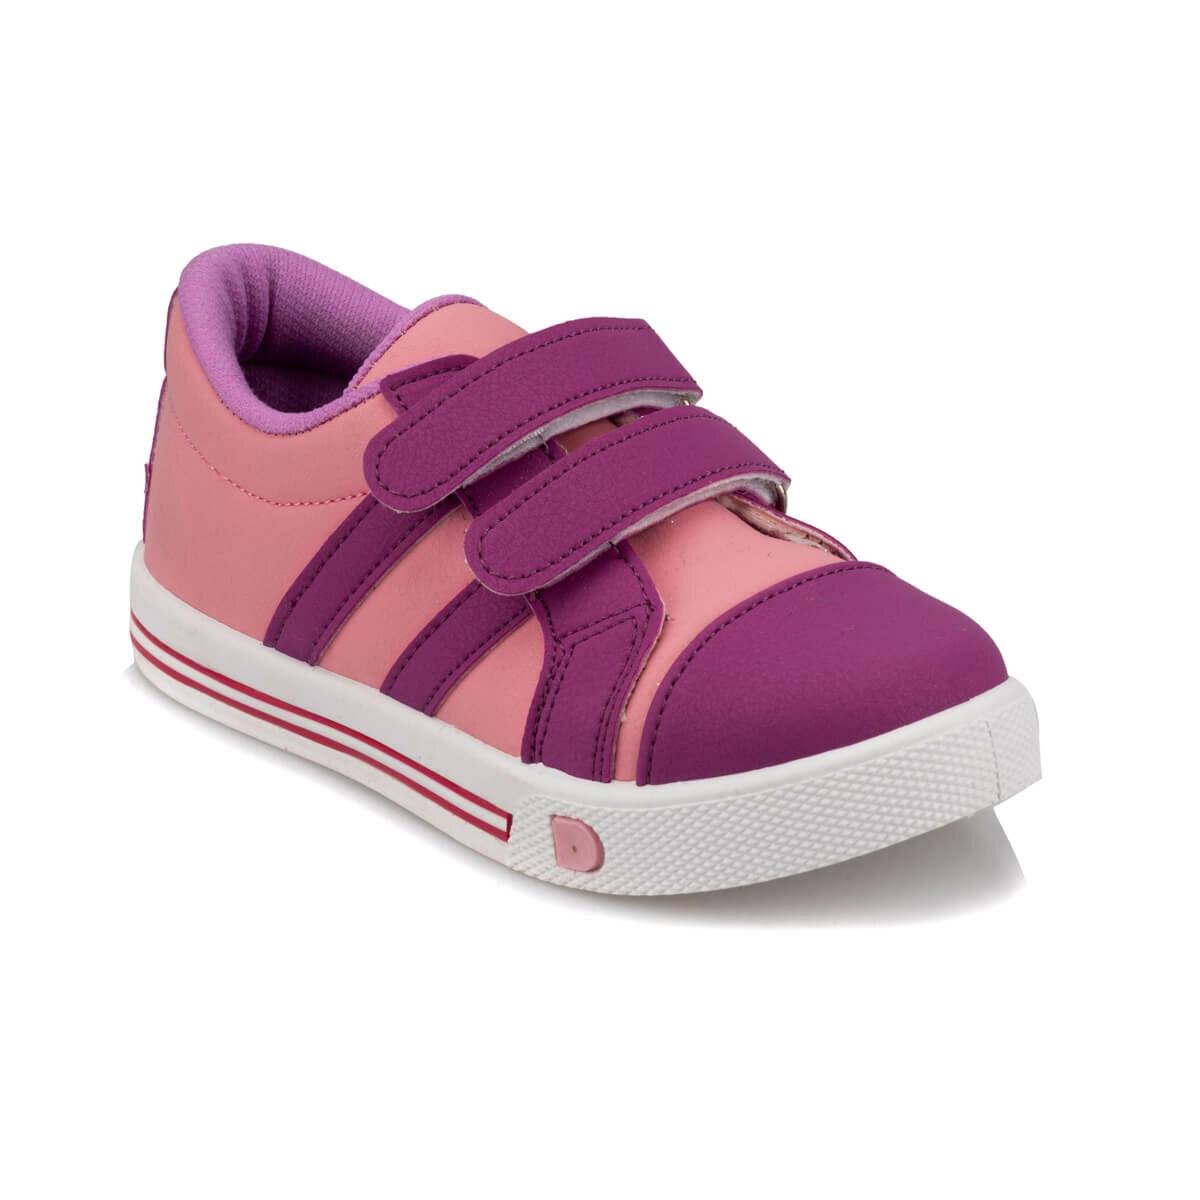 FLO 92. 511749.P Silver Female Child Sneaker Shoes Polaris